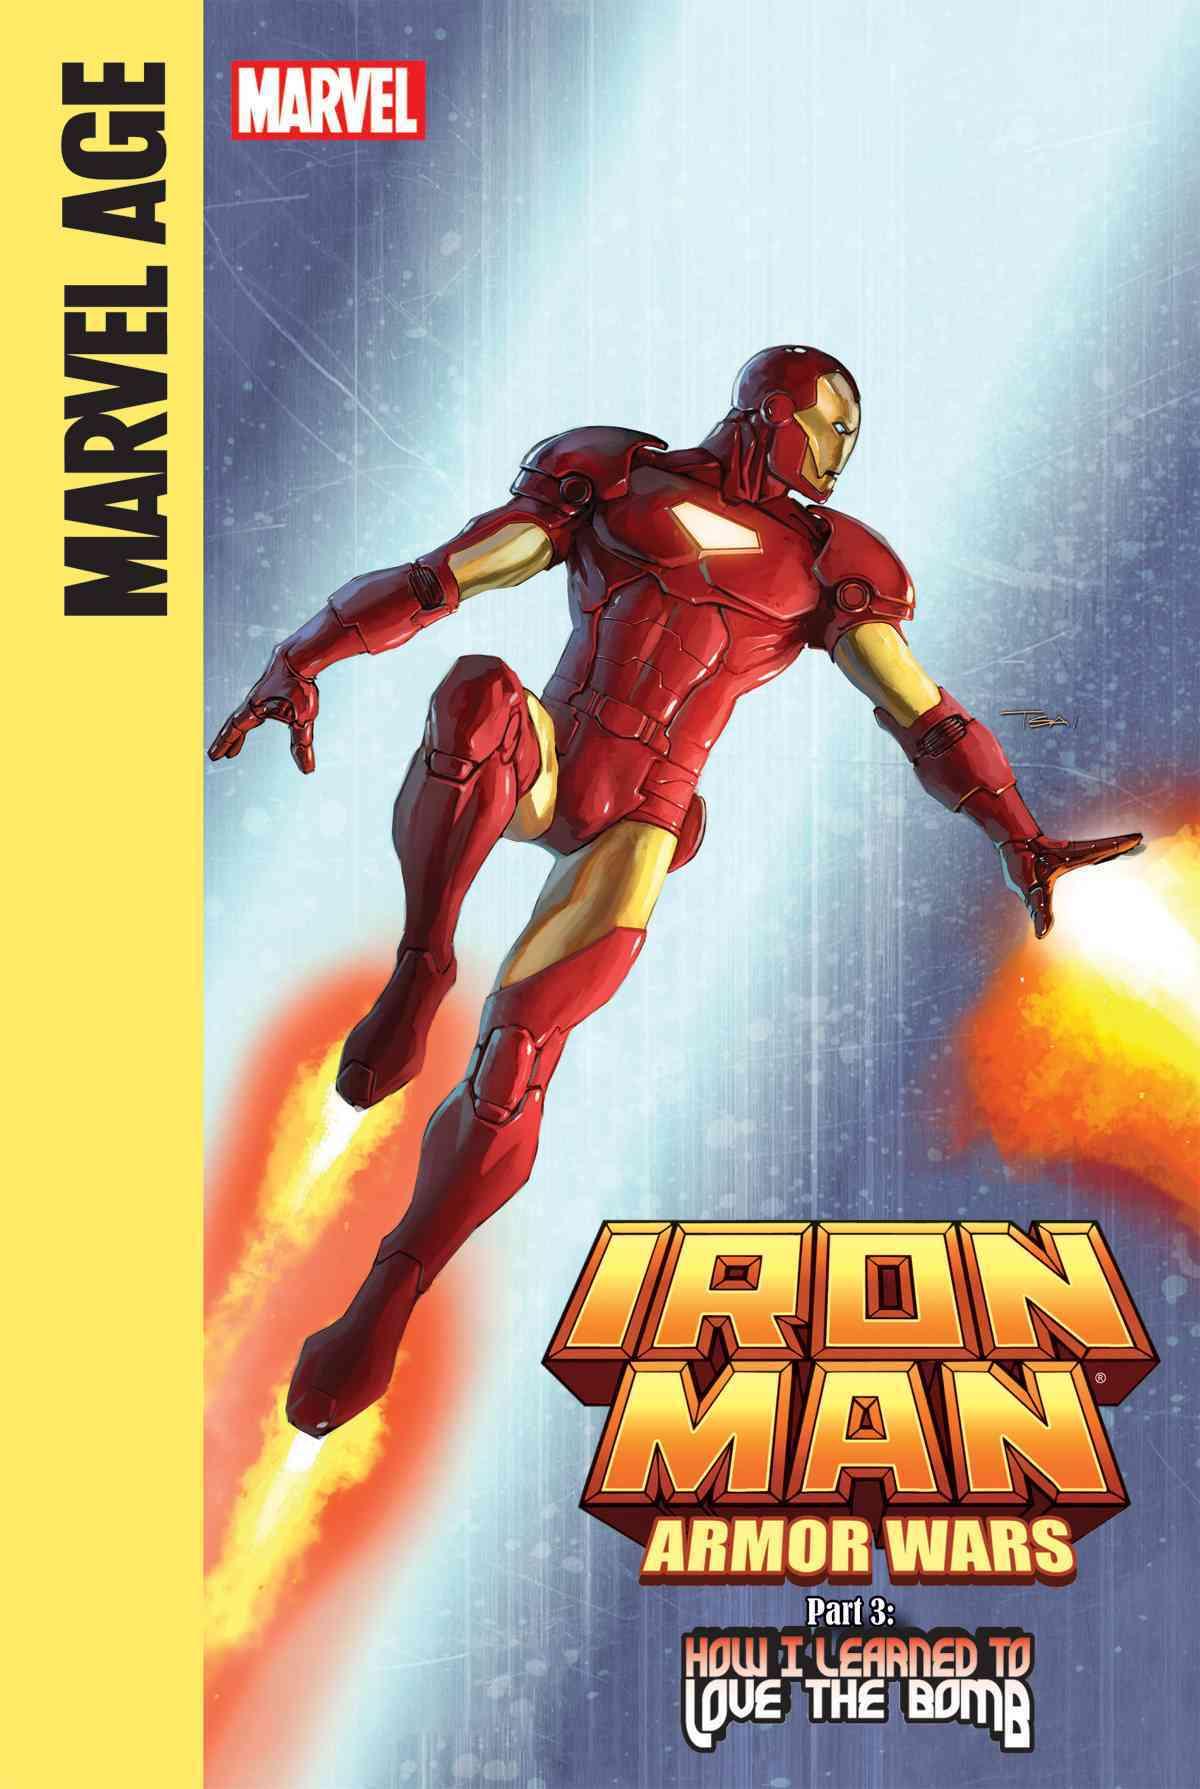 Iron Man and the Armor Wars 3 By Caramagna, Joe